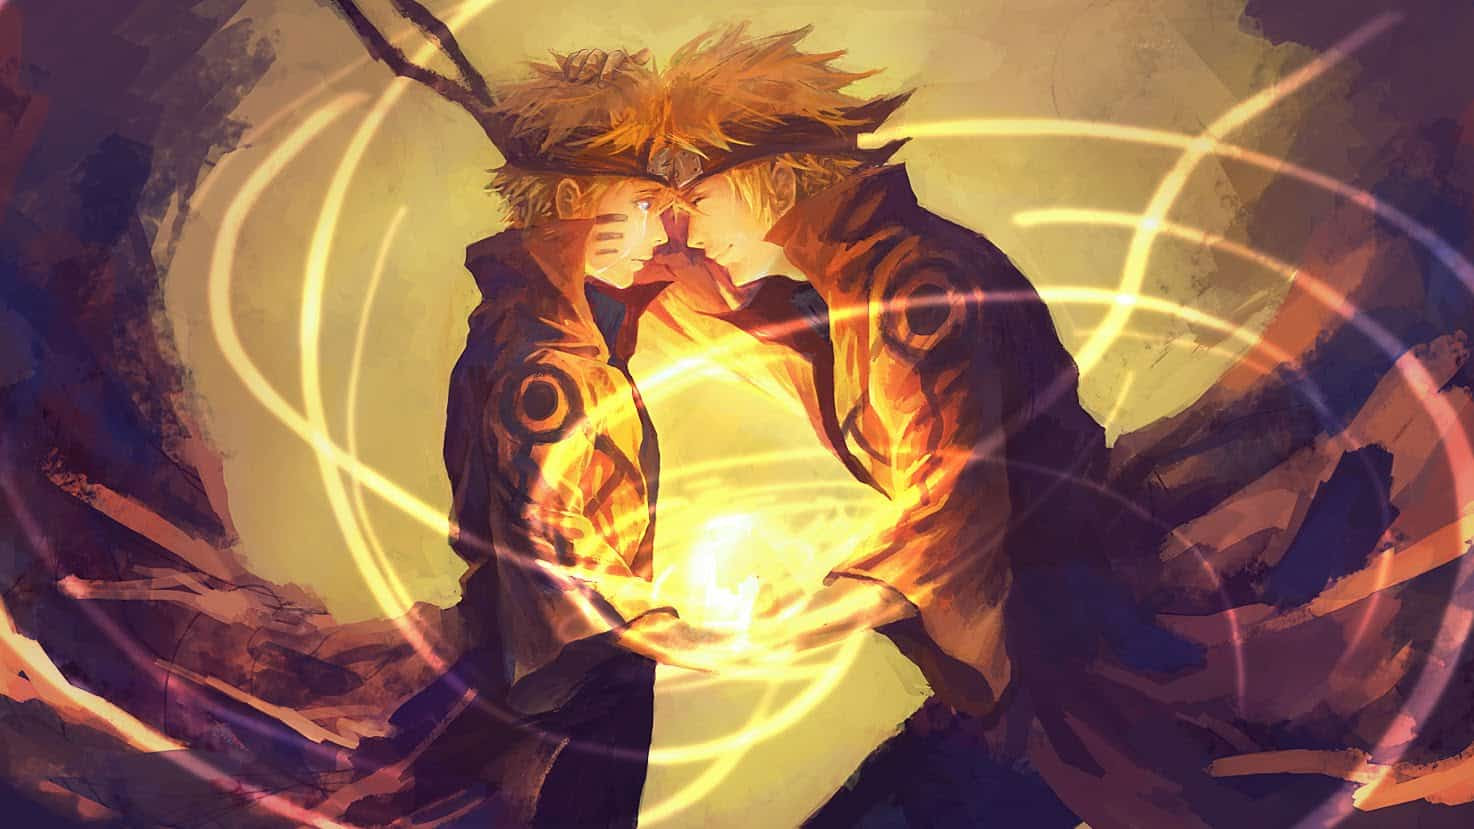 Download 44+ Emotional Anime Wallpaper Hd Foto Gratis Terbaru